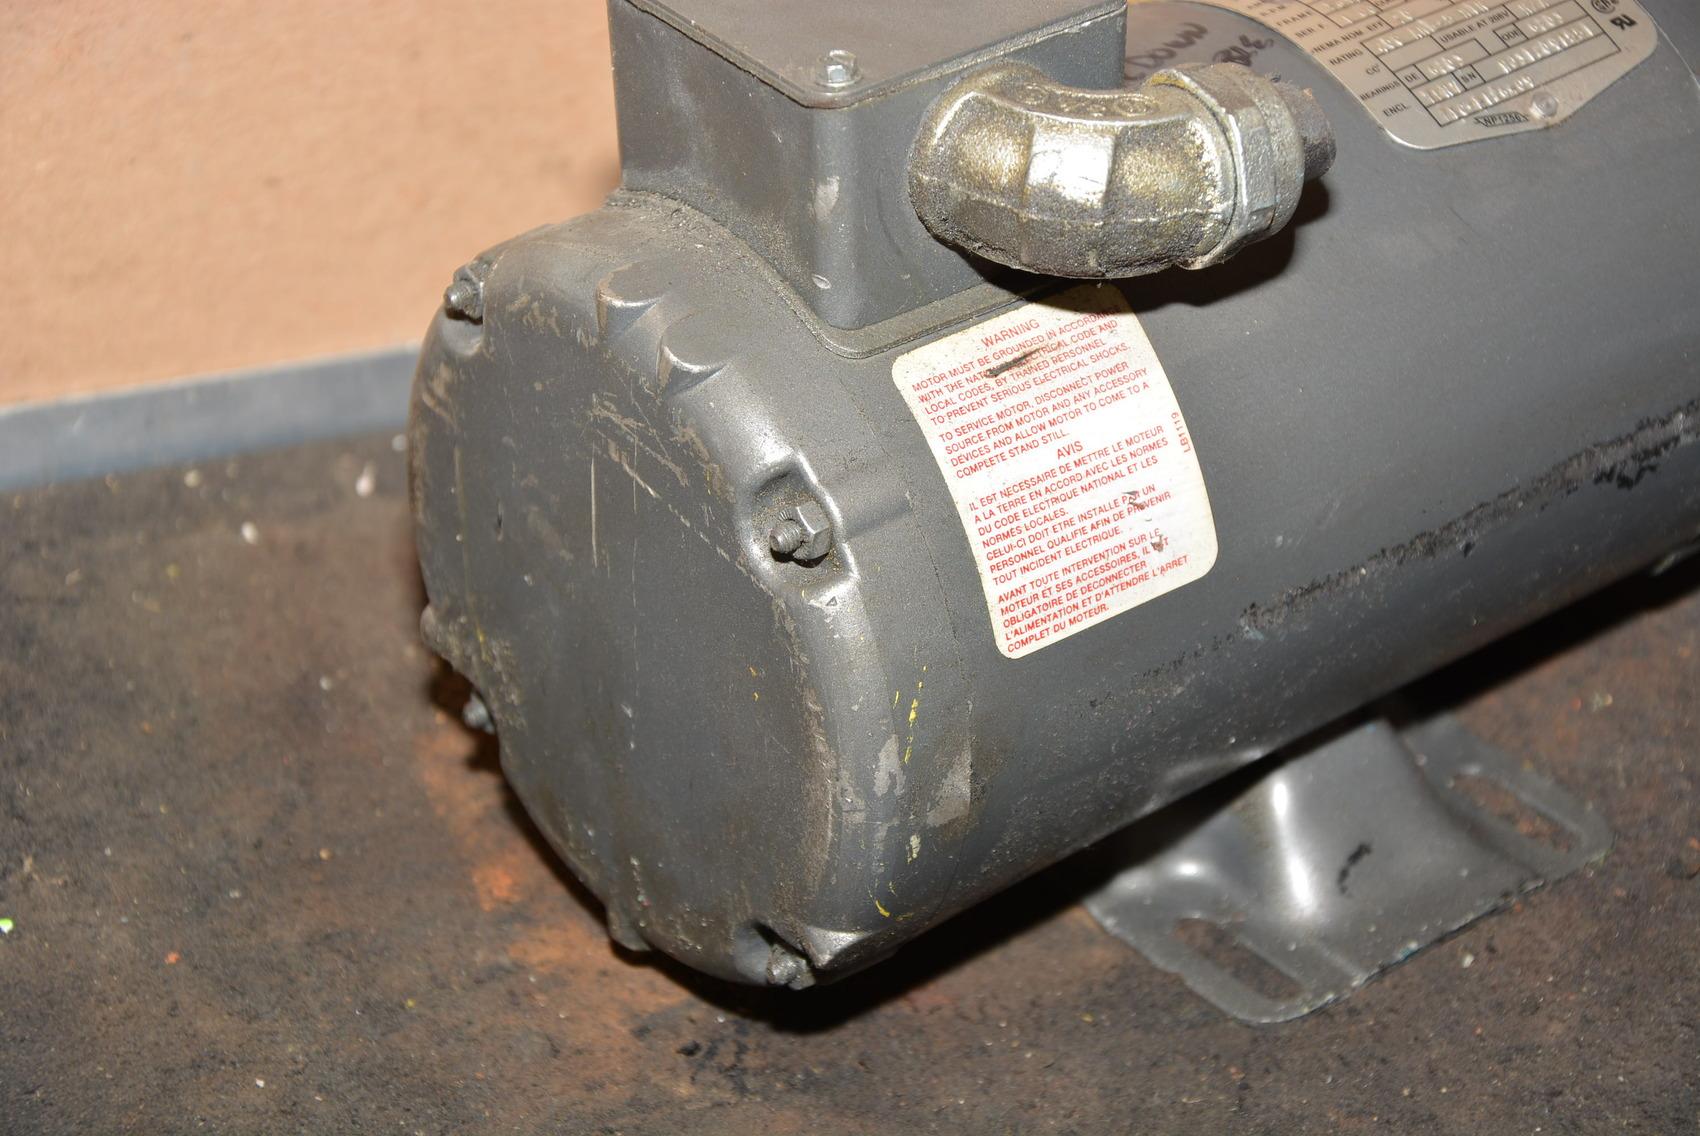 Baldor barnes 1 1 2 hp single phase 115v hydraulic pump for Baldor 2 hp single phase motor